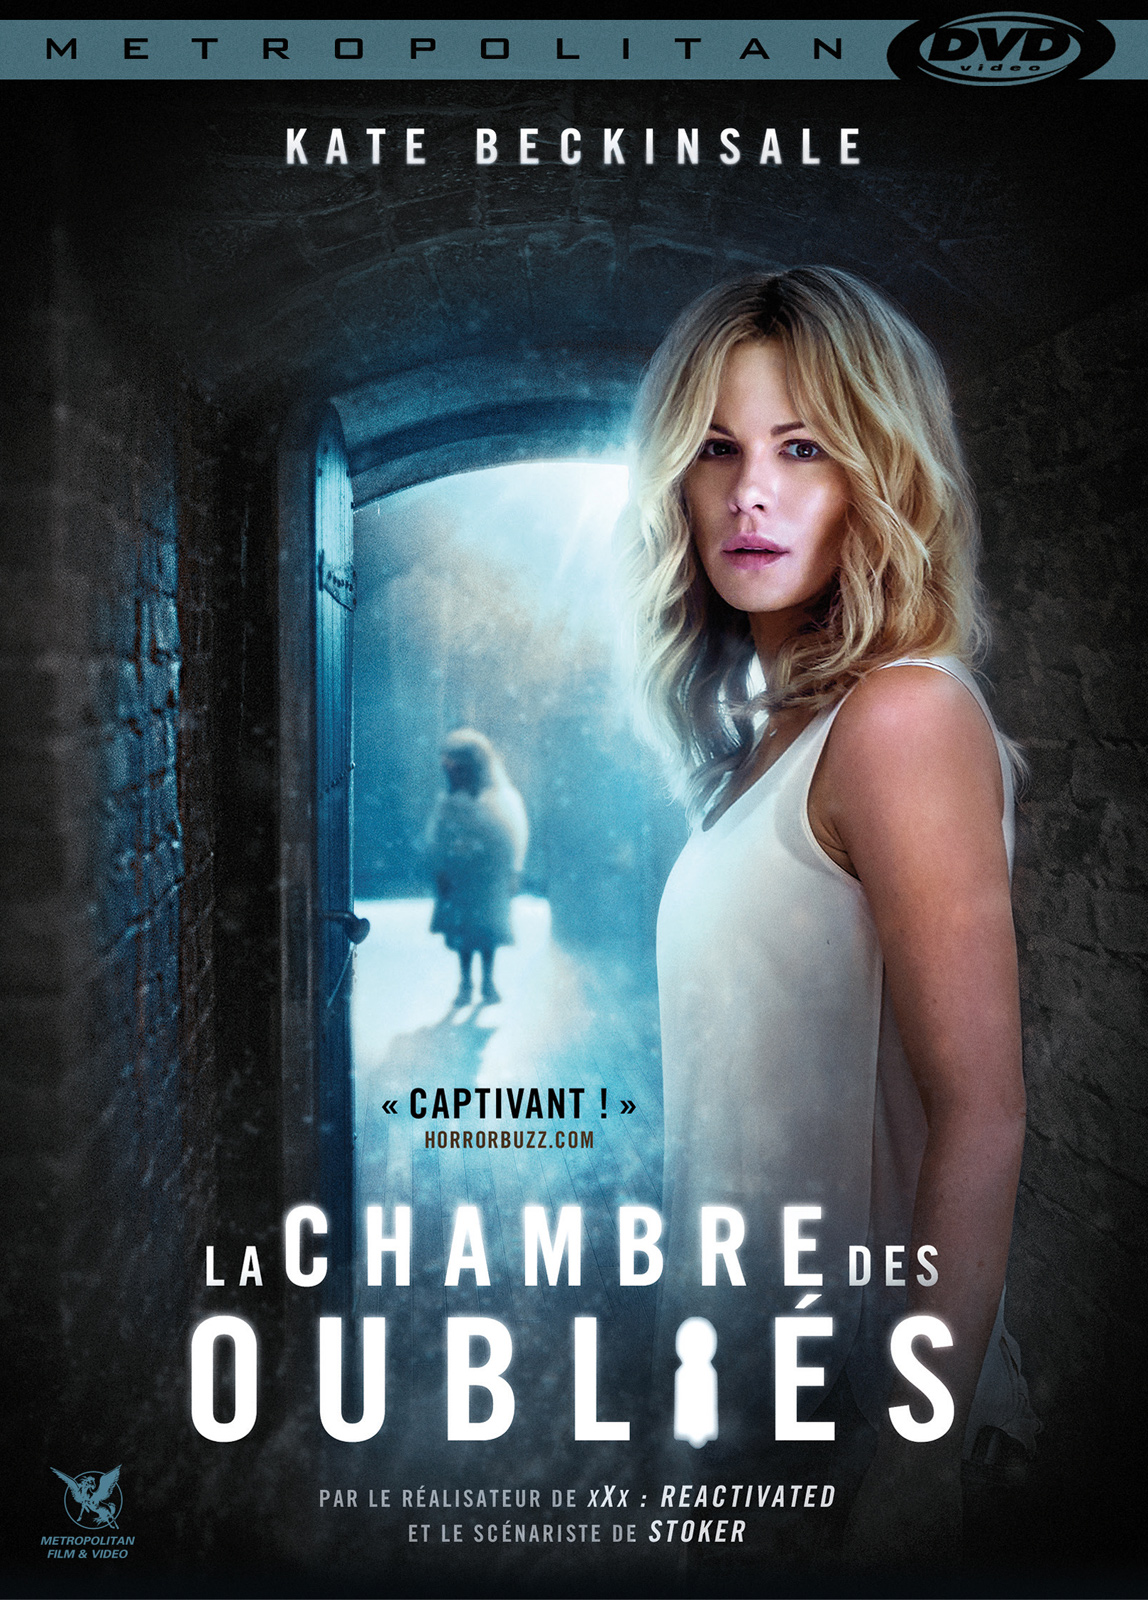 Casting du film la chambre des oubli s r alisateurs for Film marocain chambre 13 komplett